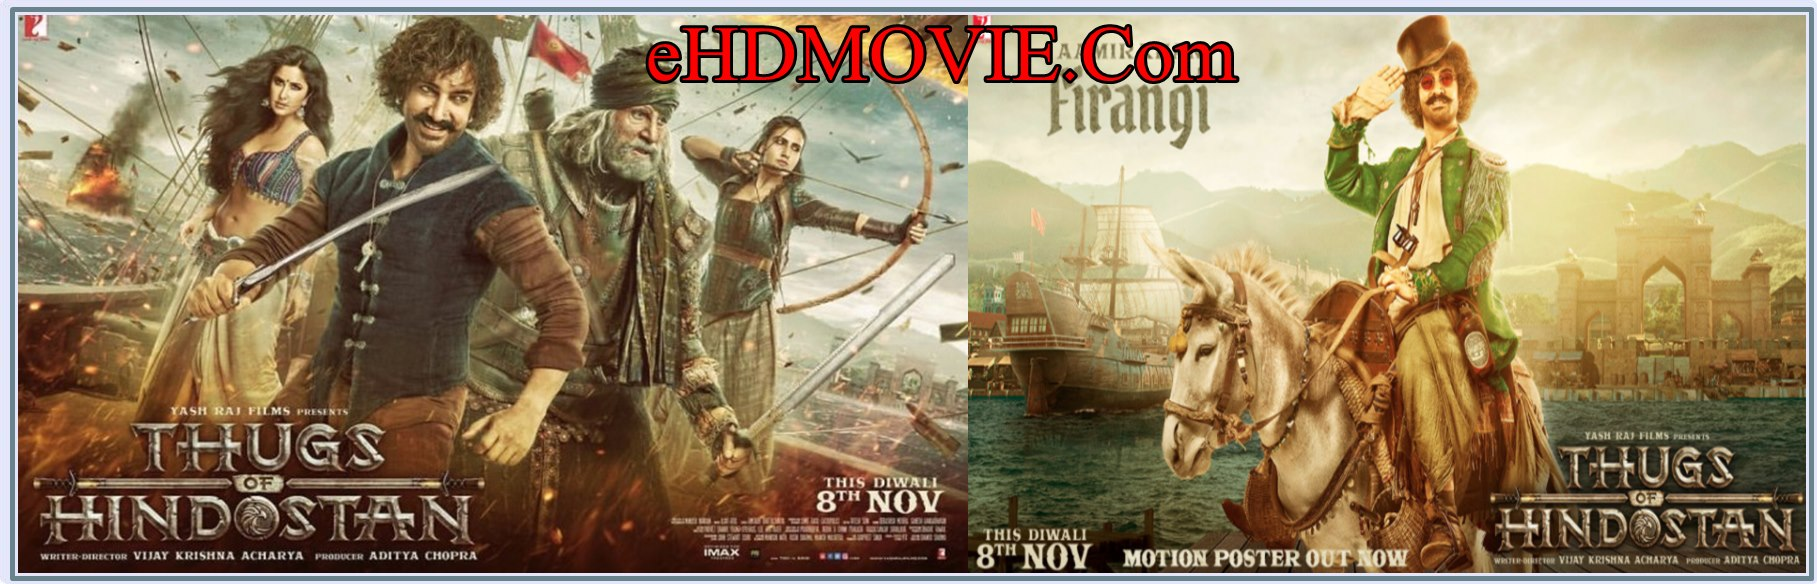 Thugs of Hindostan 2018 Full Movie Hindi 720p - 480p ORG Pre-DvD 400MB - 700MB - 1.3GB ESubs Free Download